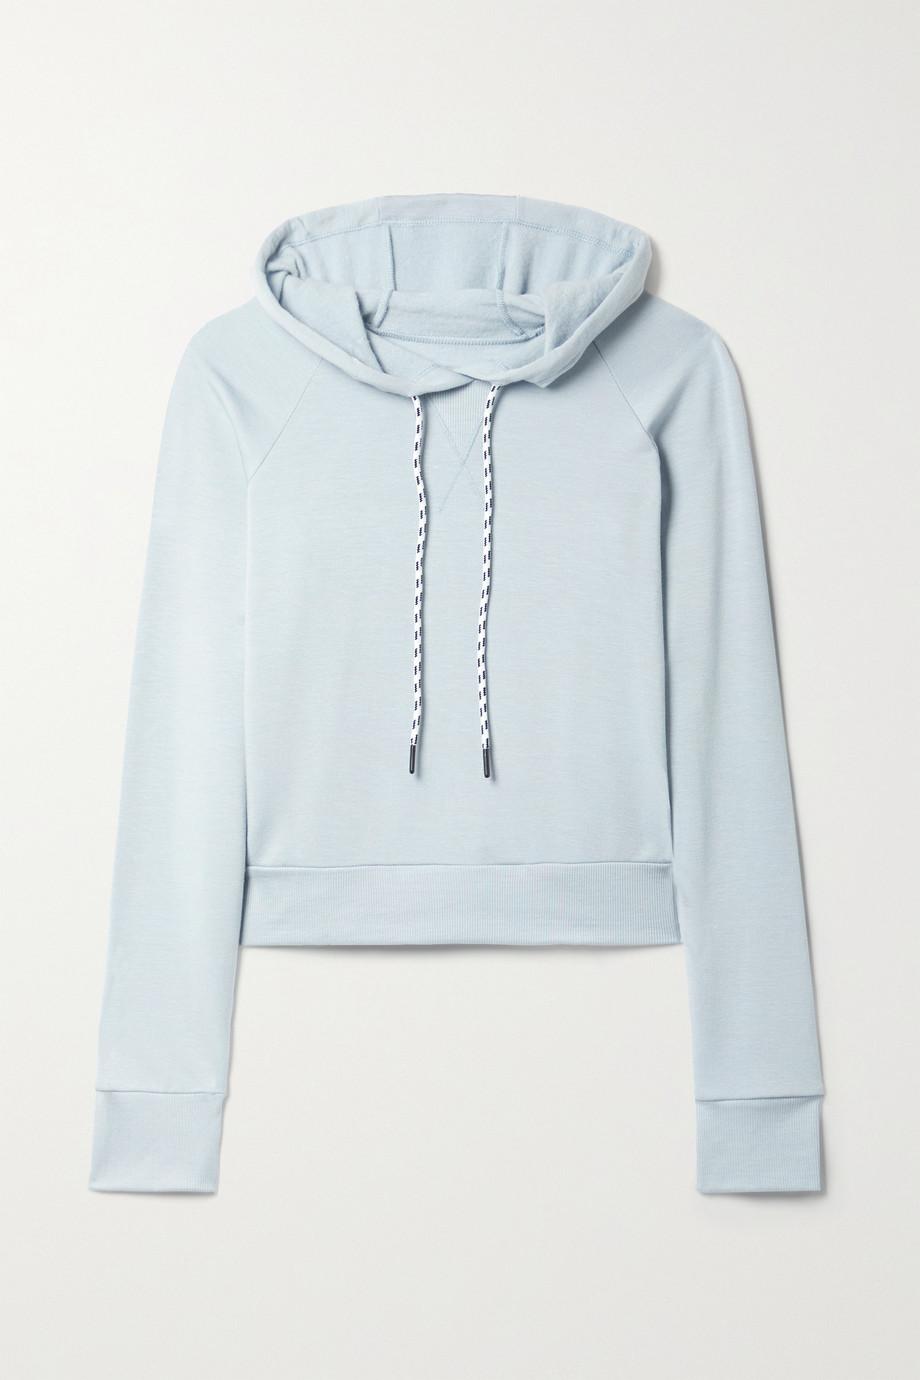 Splits59 Norma stretch-modal jersey hoodie